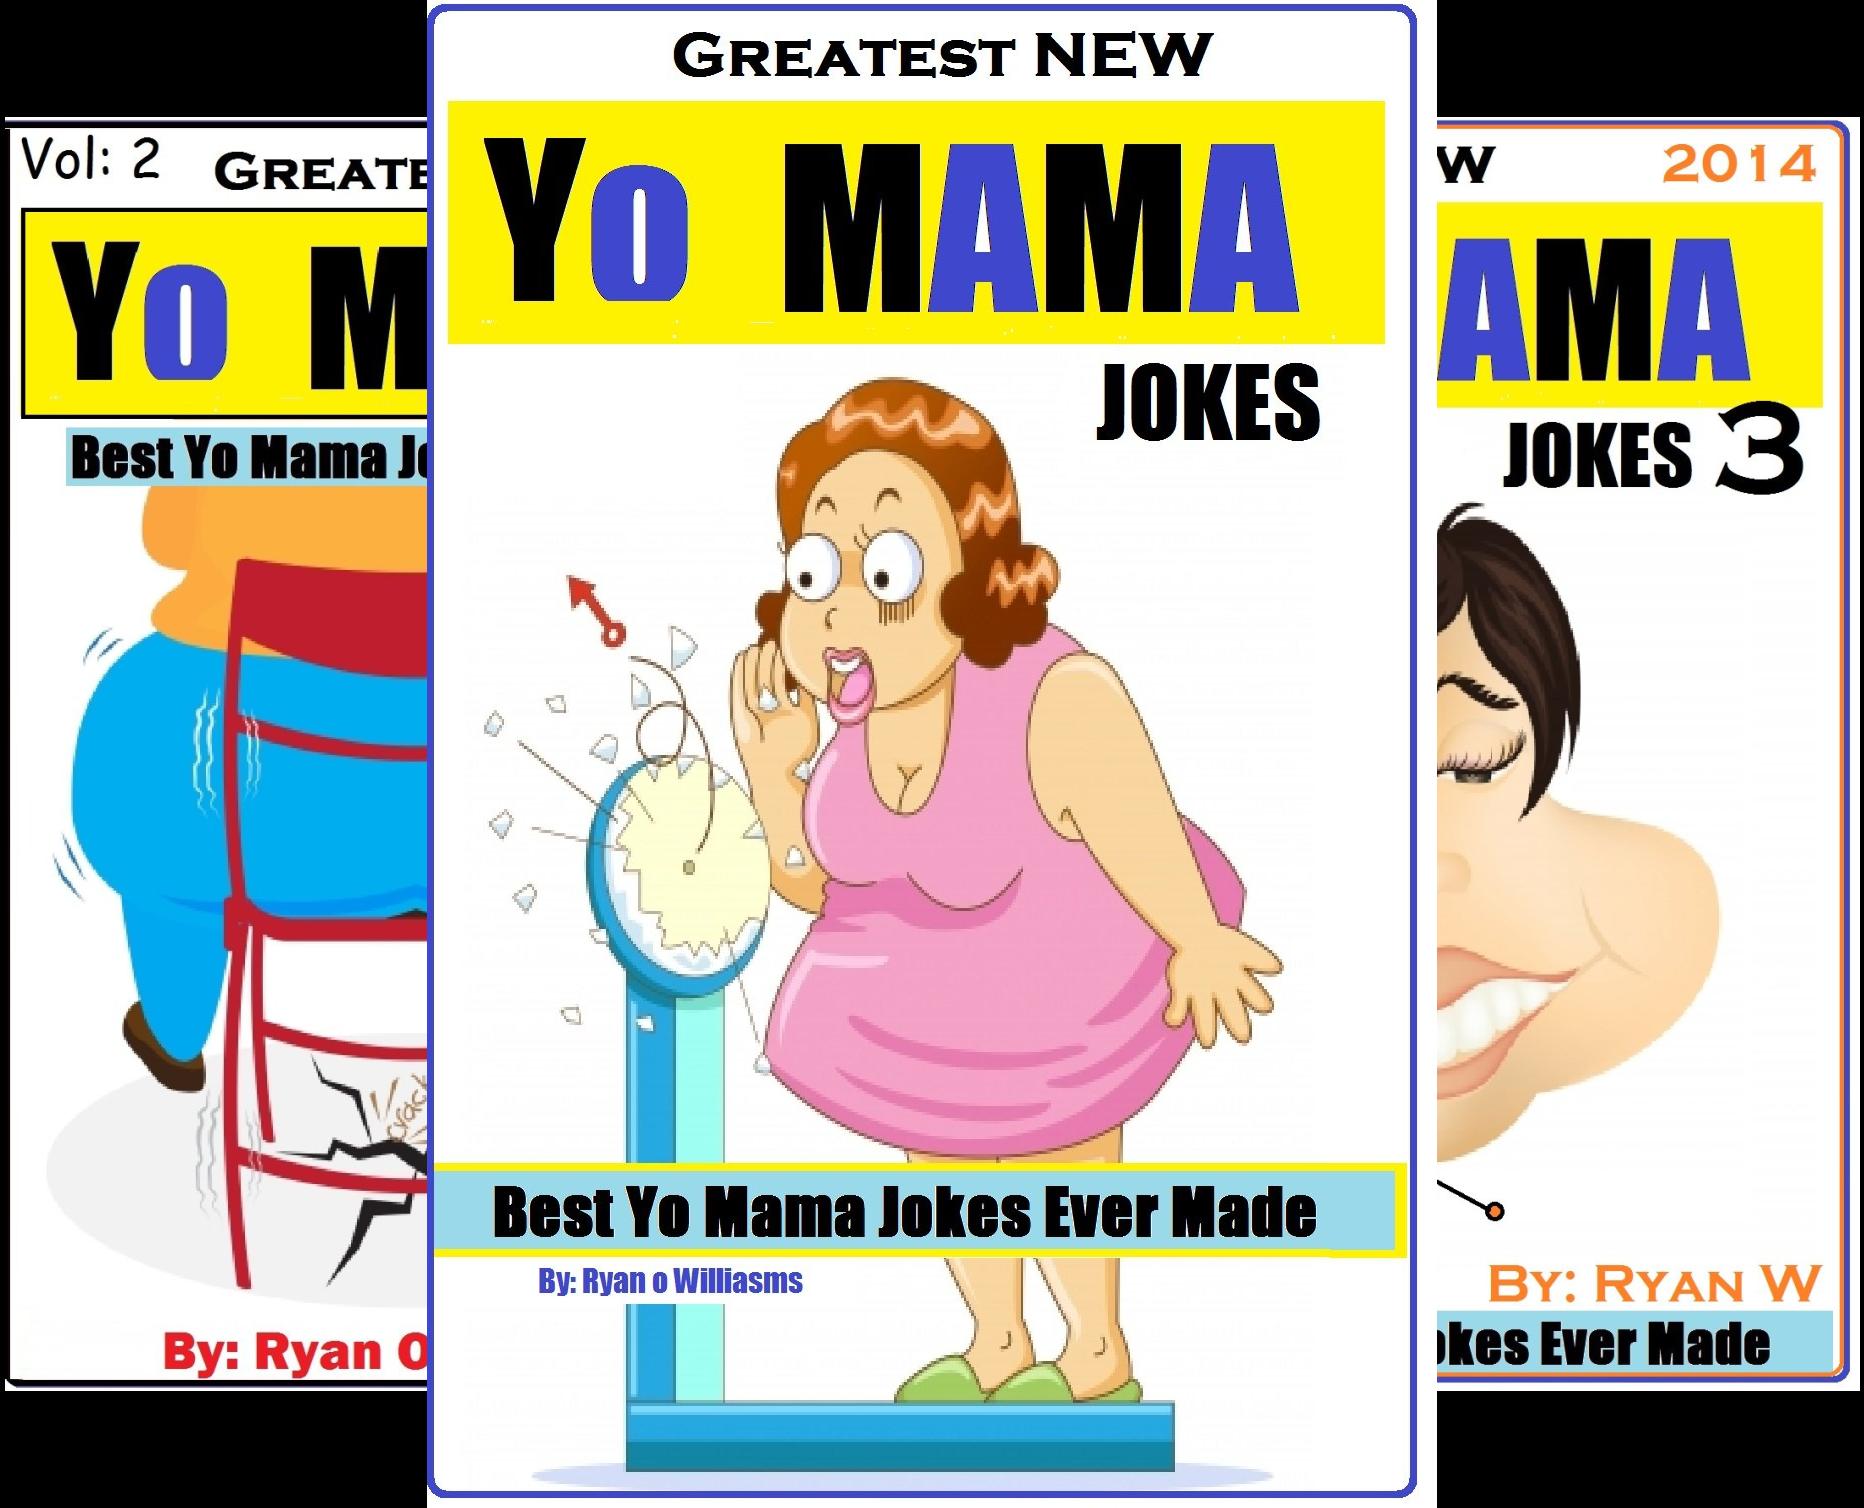 what is the best yo mama joke ever